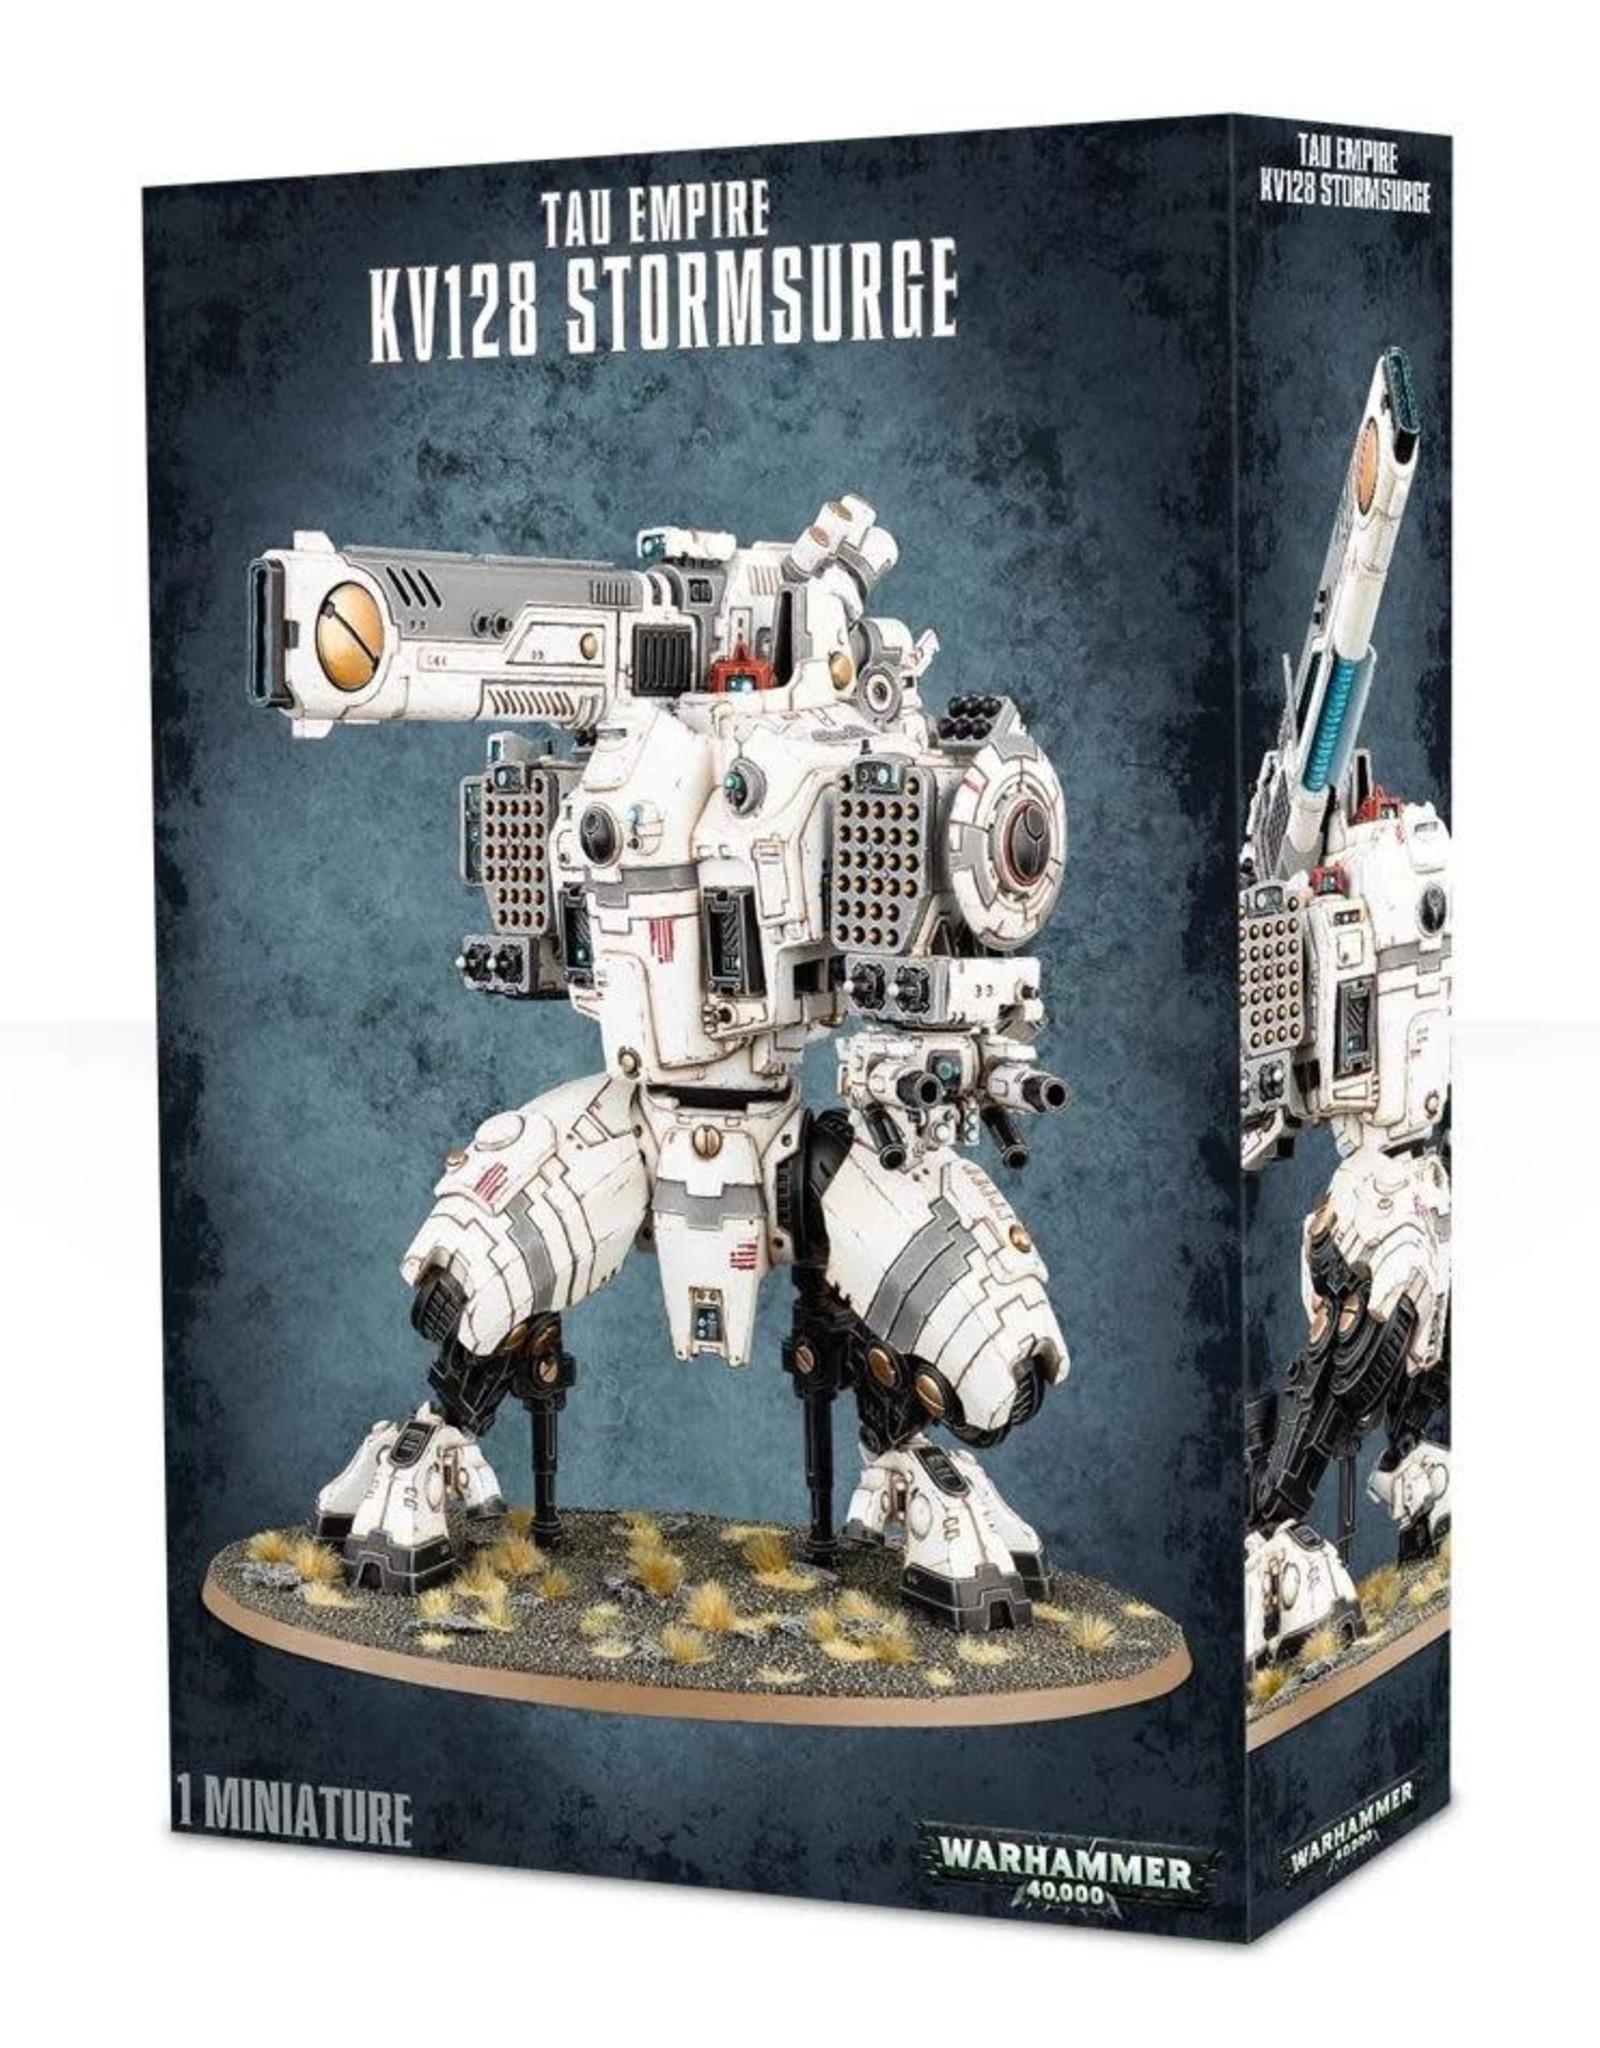 Warhammer 40K Tau Empire KV128 Stormsurge